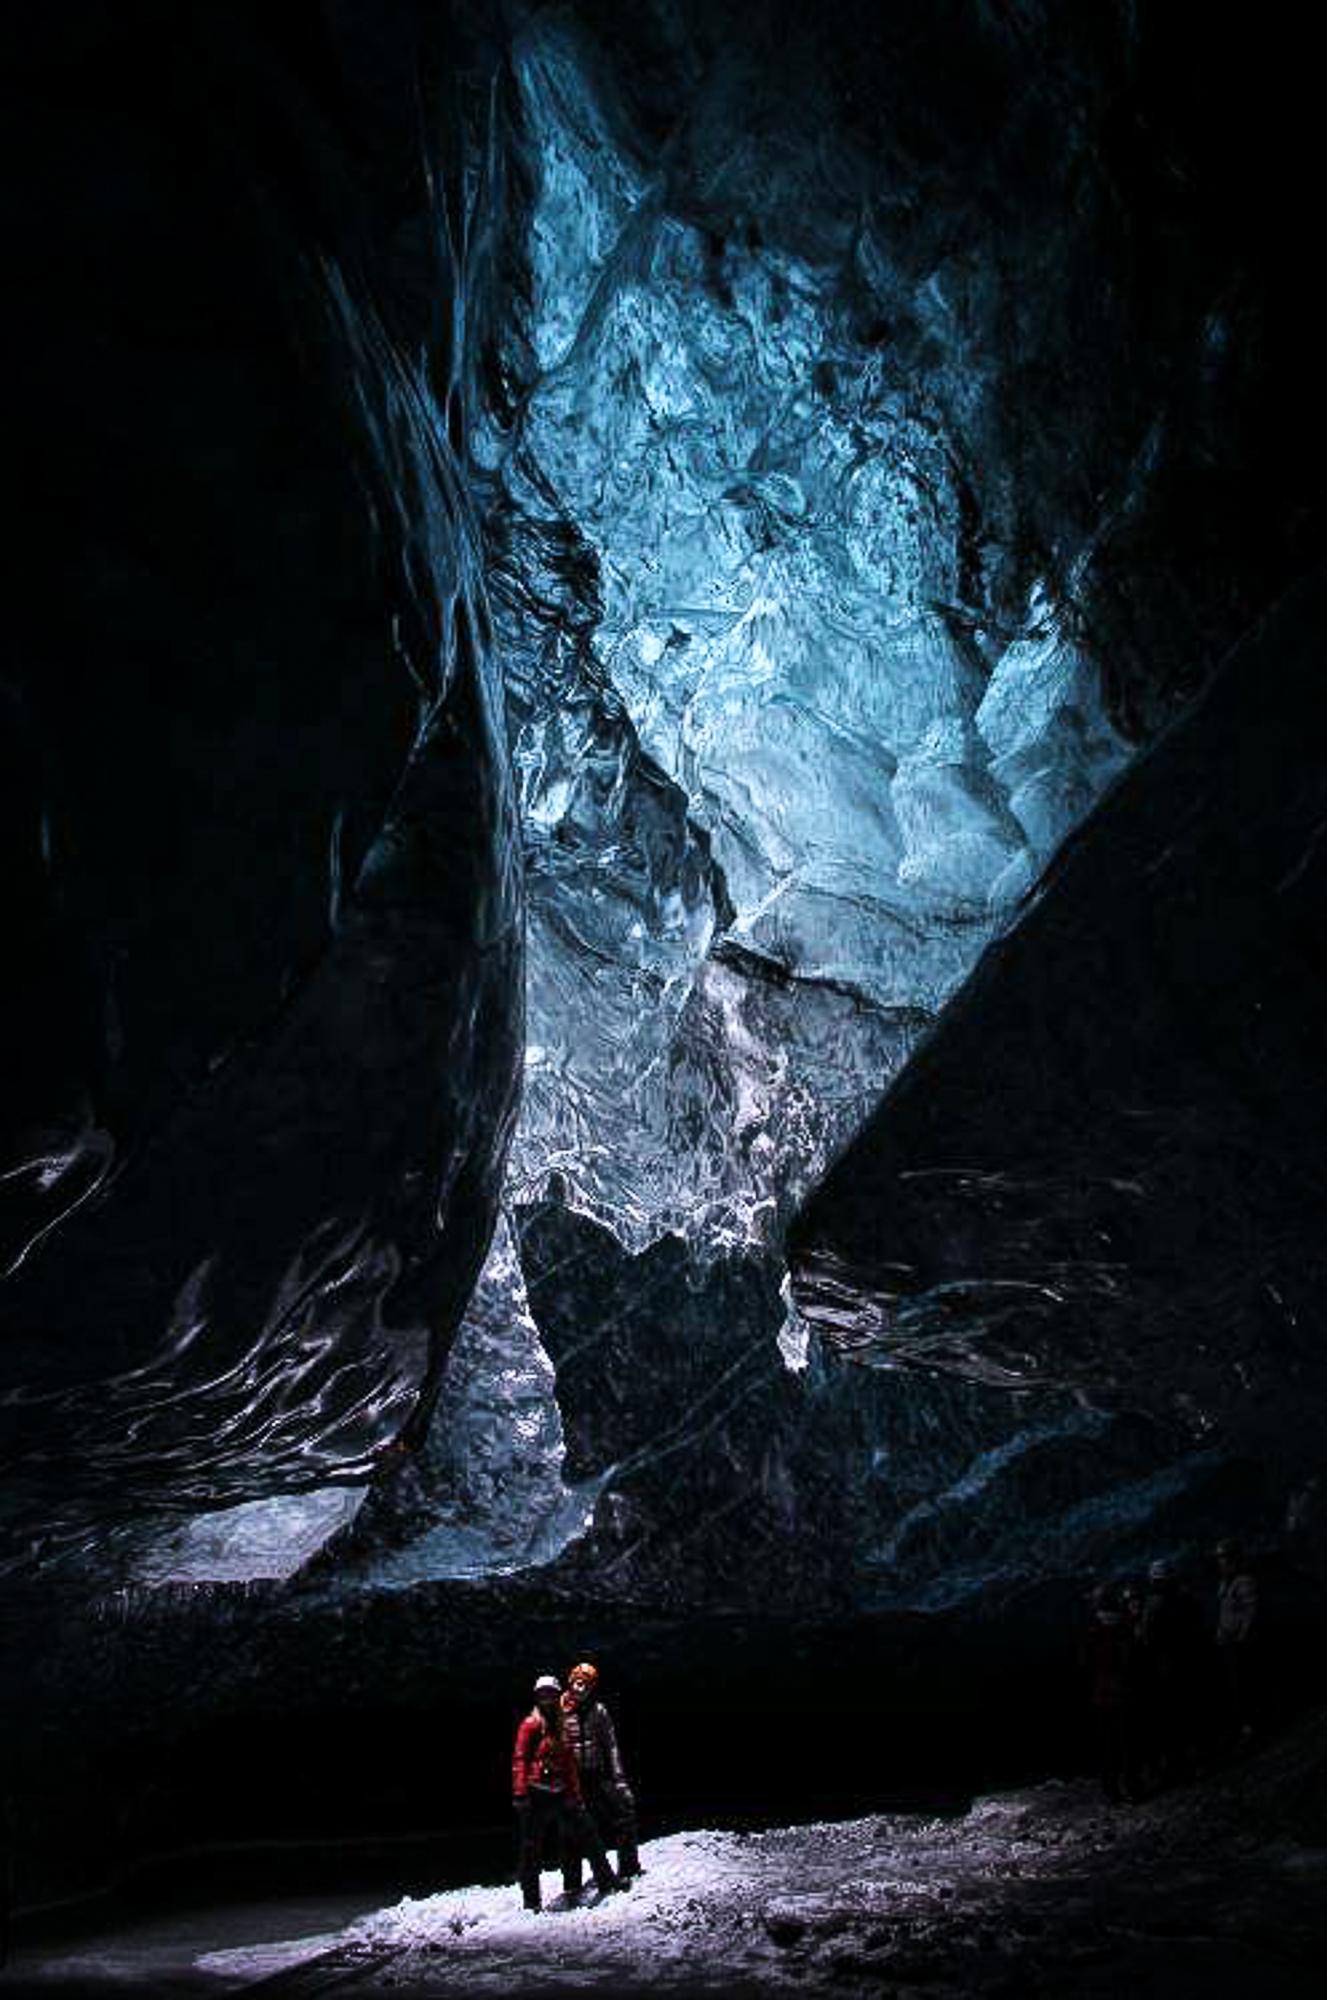 IceCavesJONAA©Agust Runarsson-14.jpg